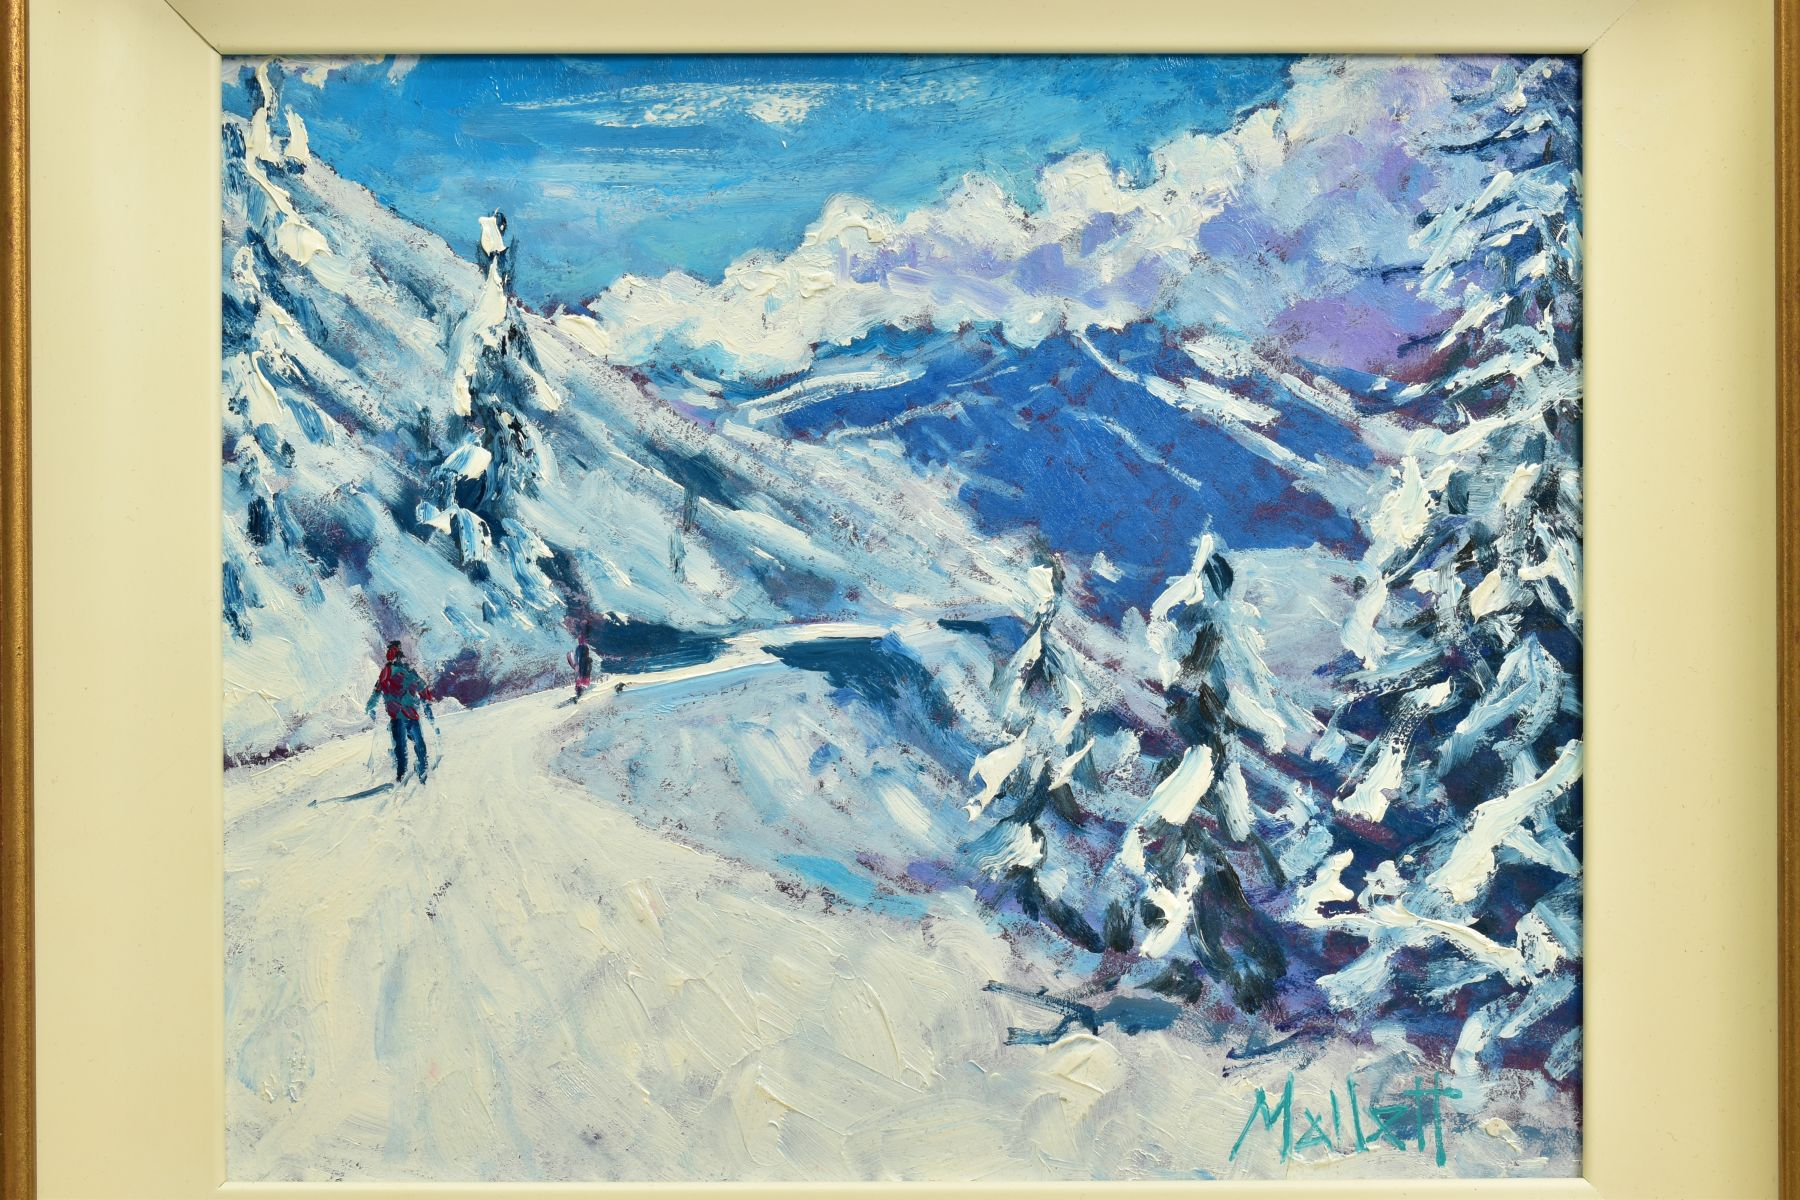 TIMMY MALLETT (BRITISH CONTEMPORARY), 'Winter Fun', an impressionist Alpine scene with skiers, - Image 2 of 7